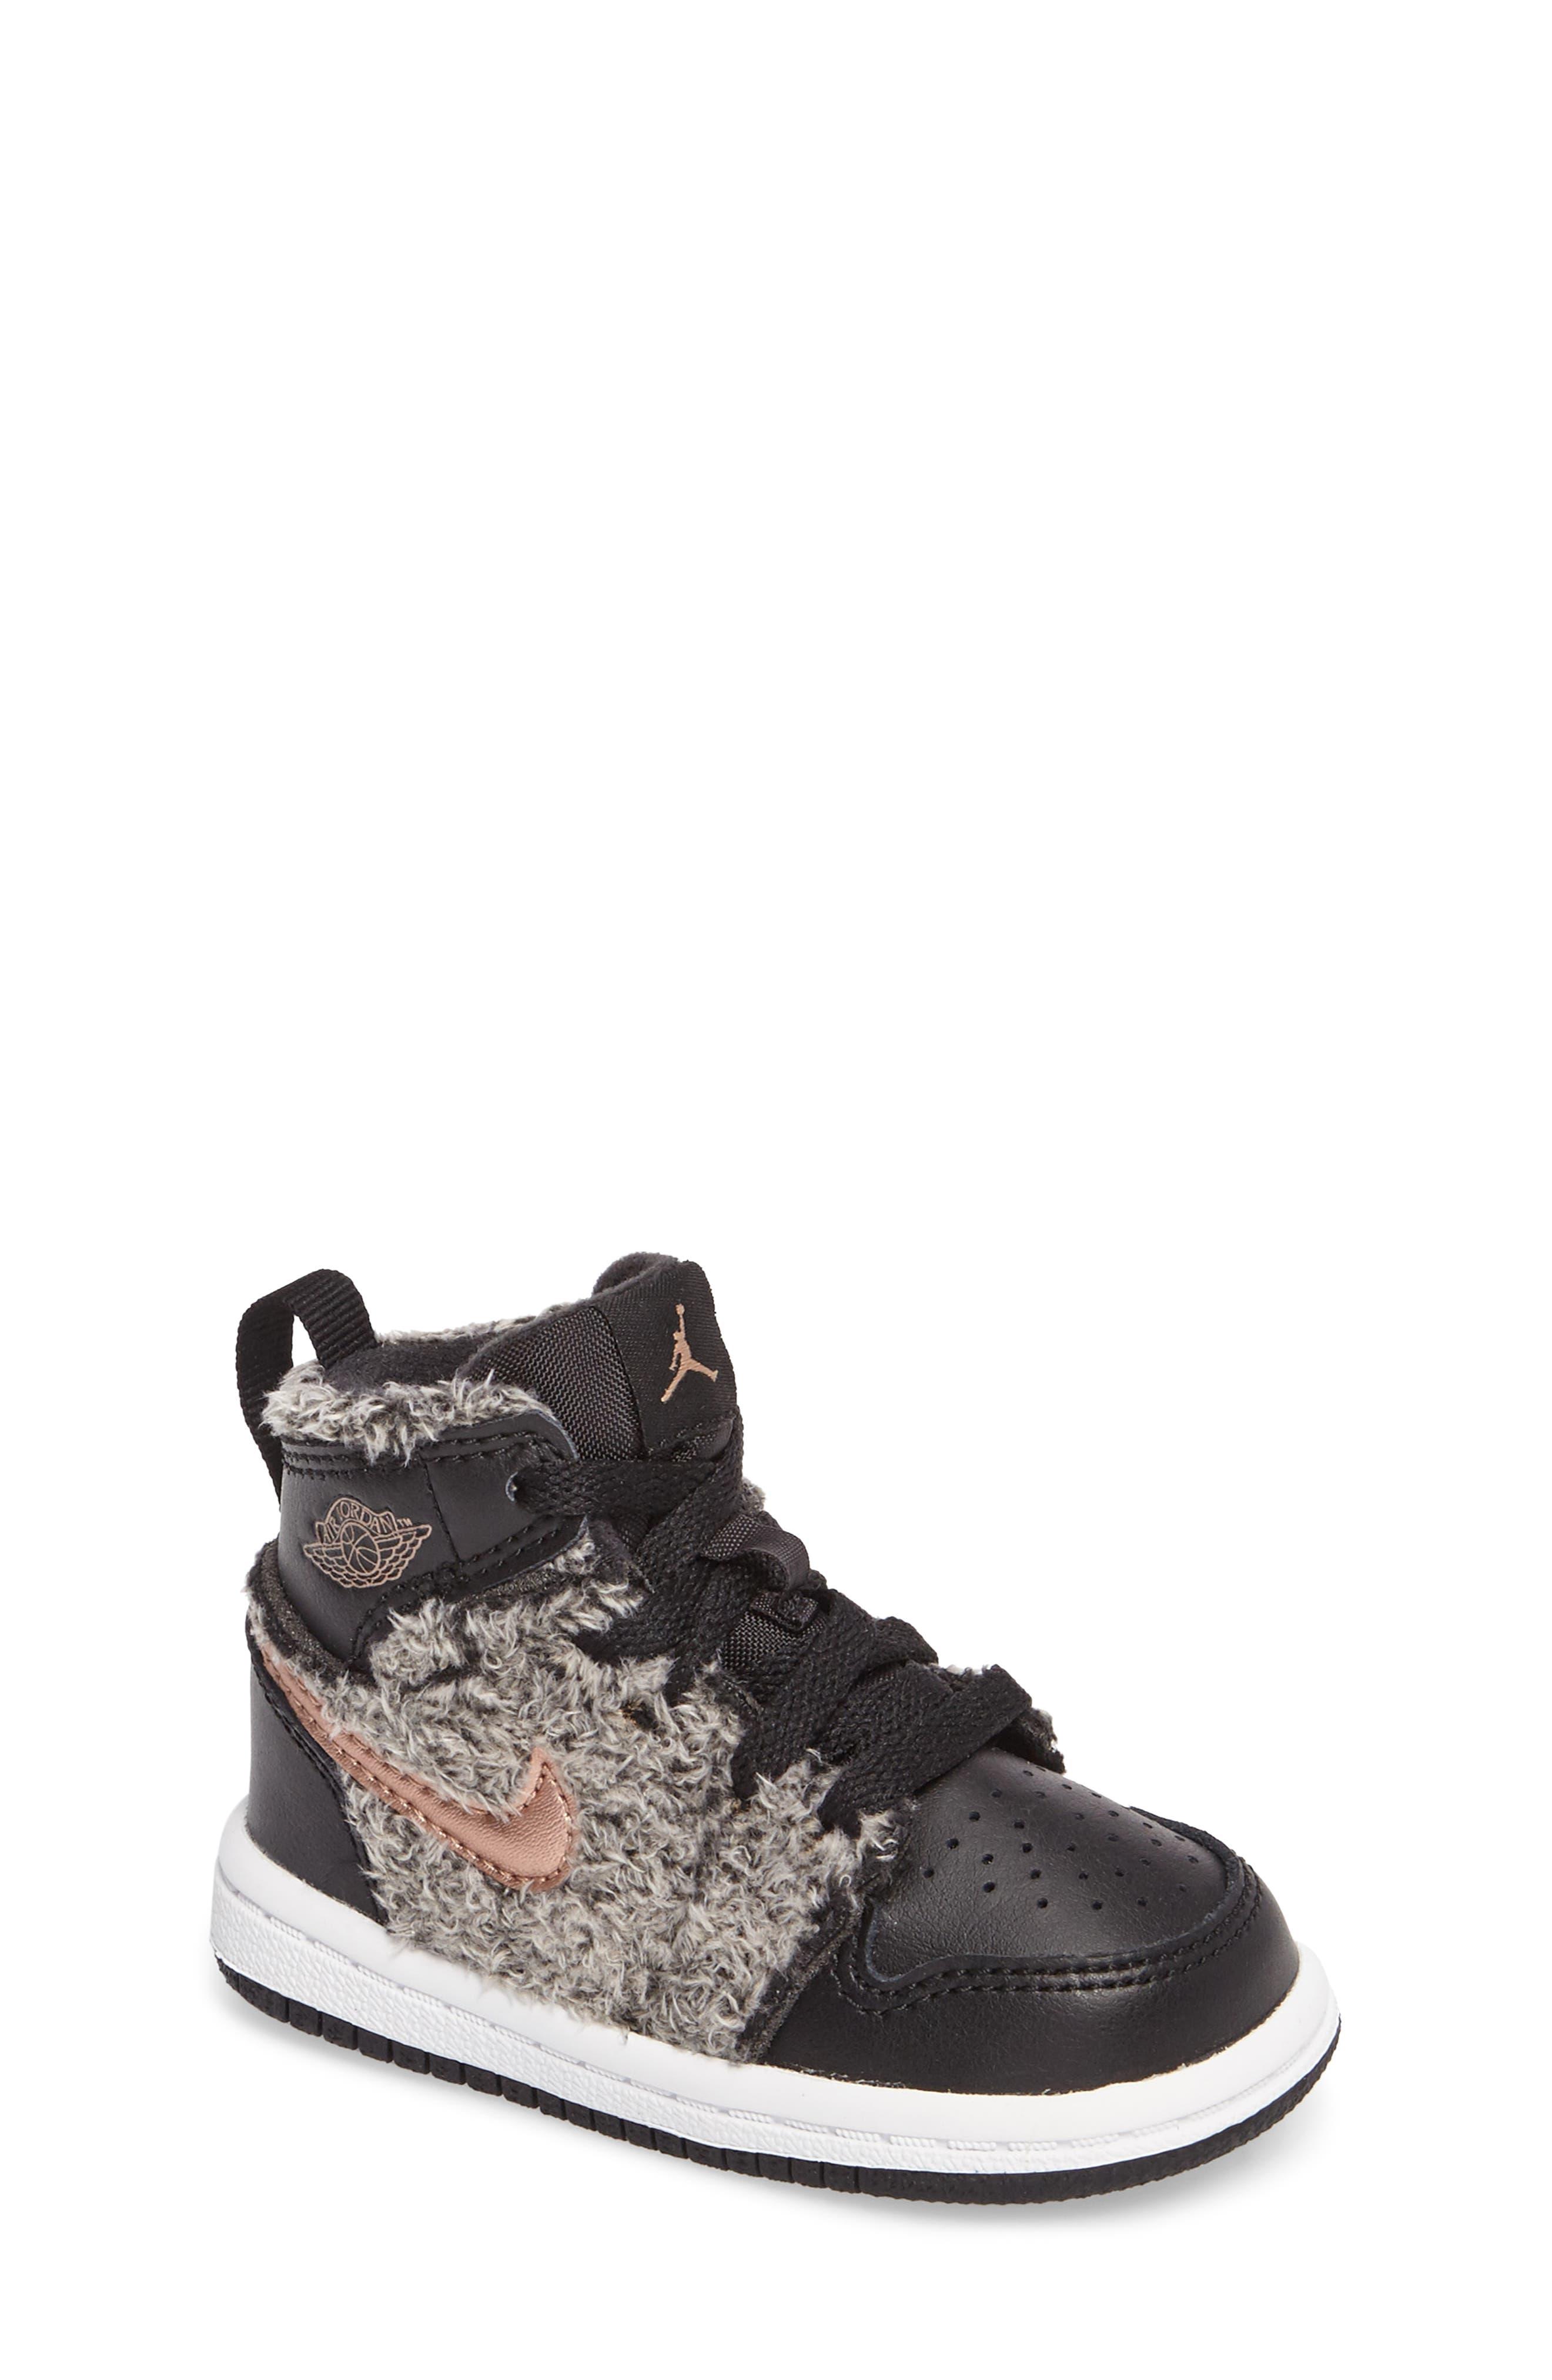 Main Image - Nike Air Jordan 1 Retro High Top Basketball Shoe (Baby, Walker and Toddler)